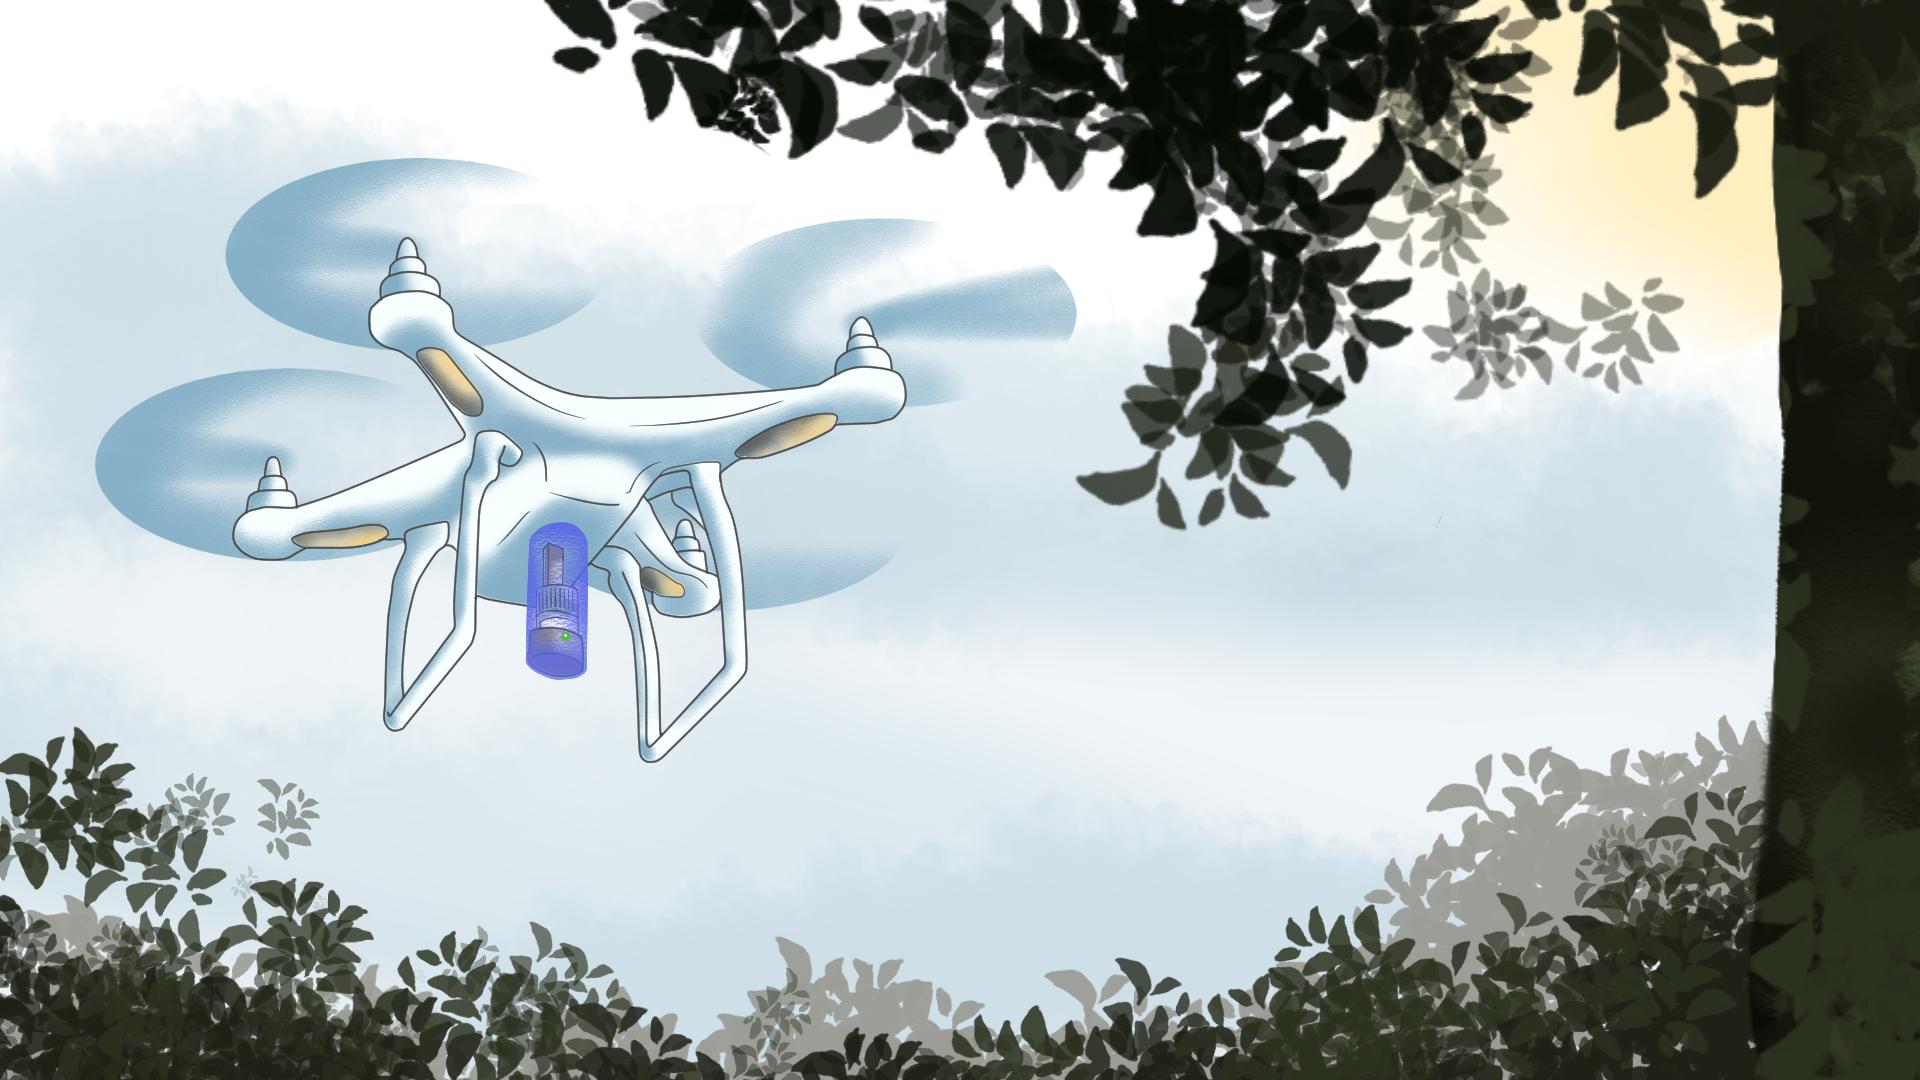 SC_Drohne